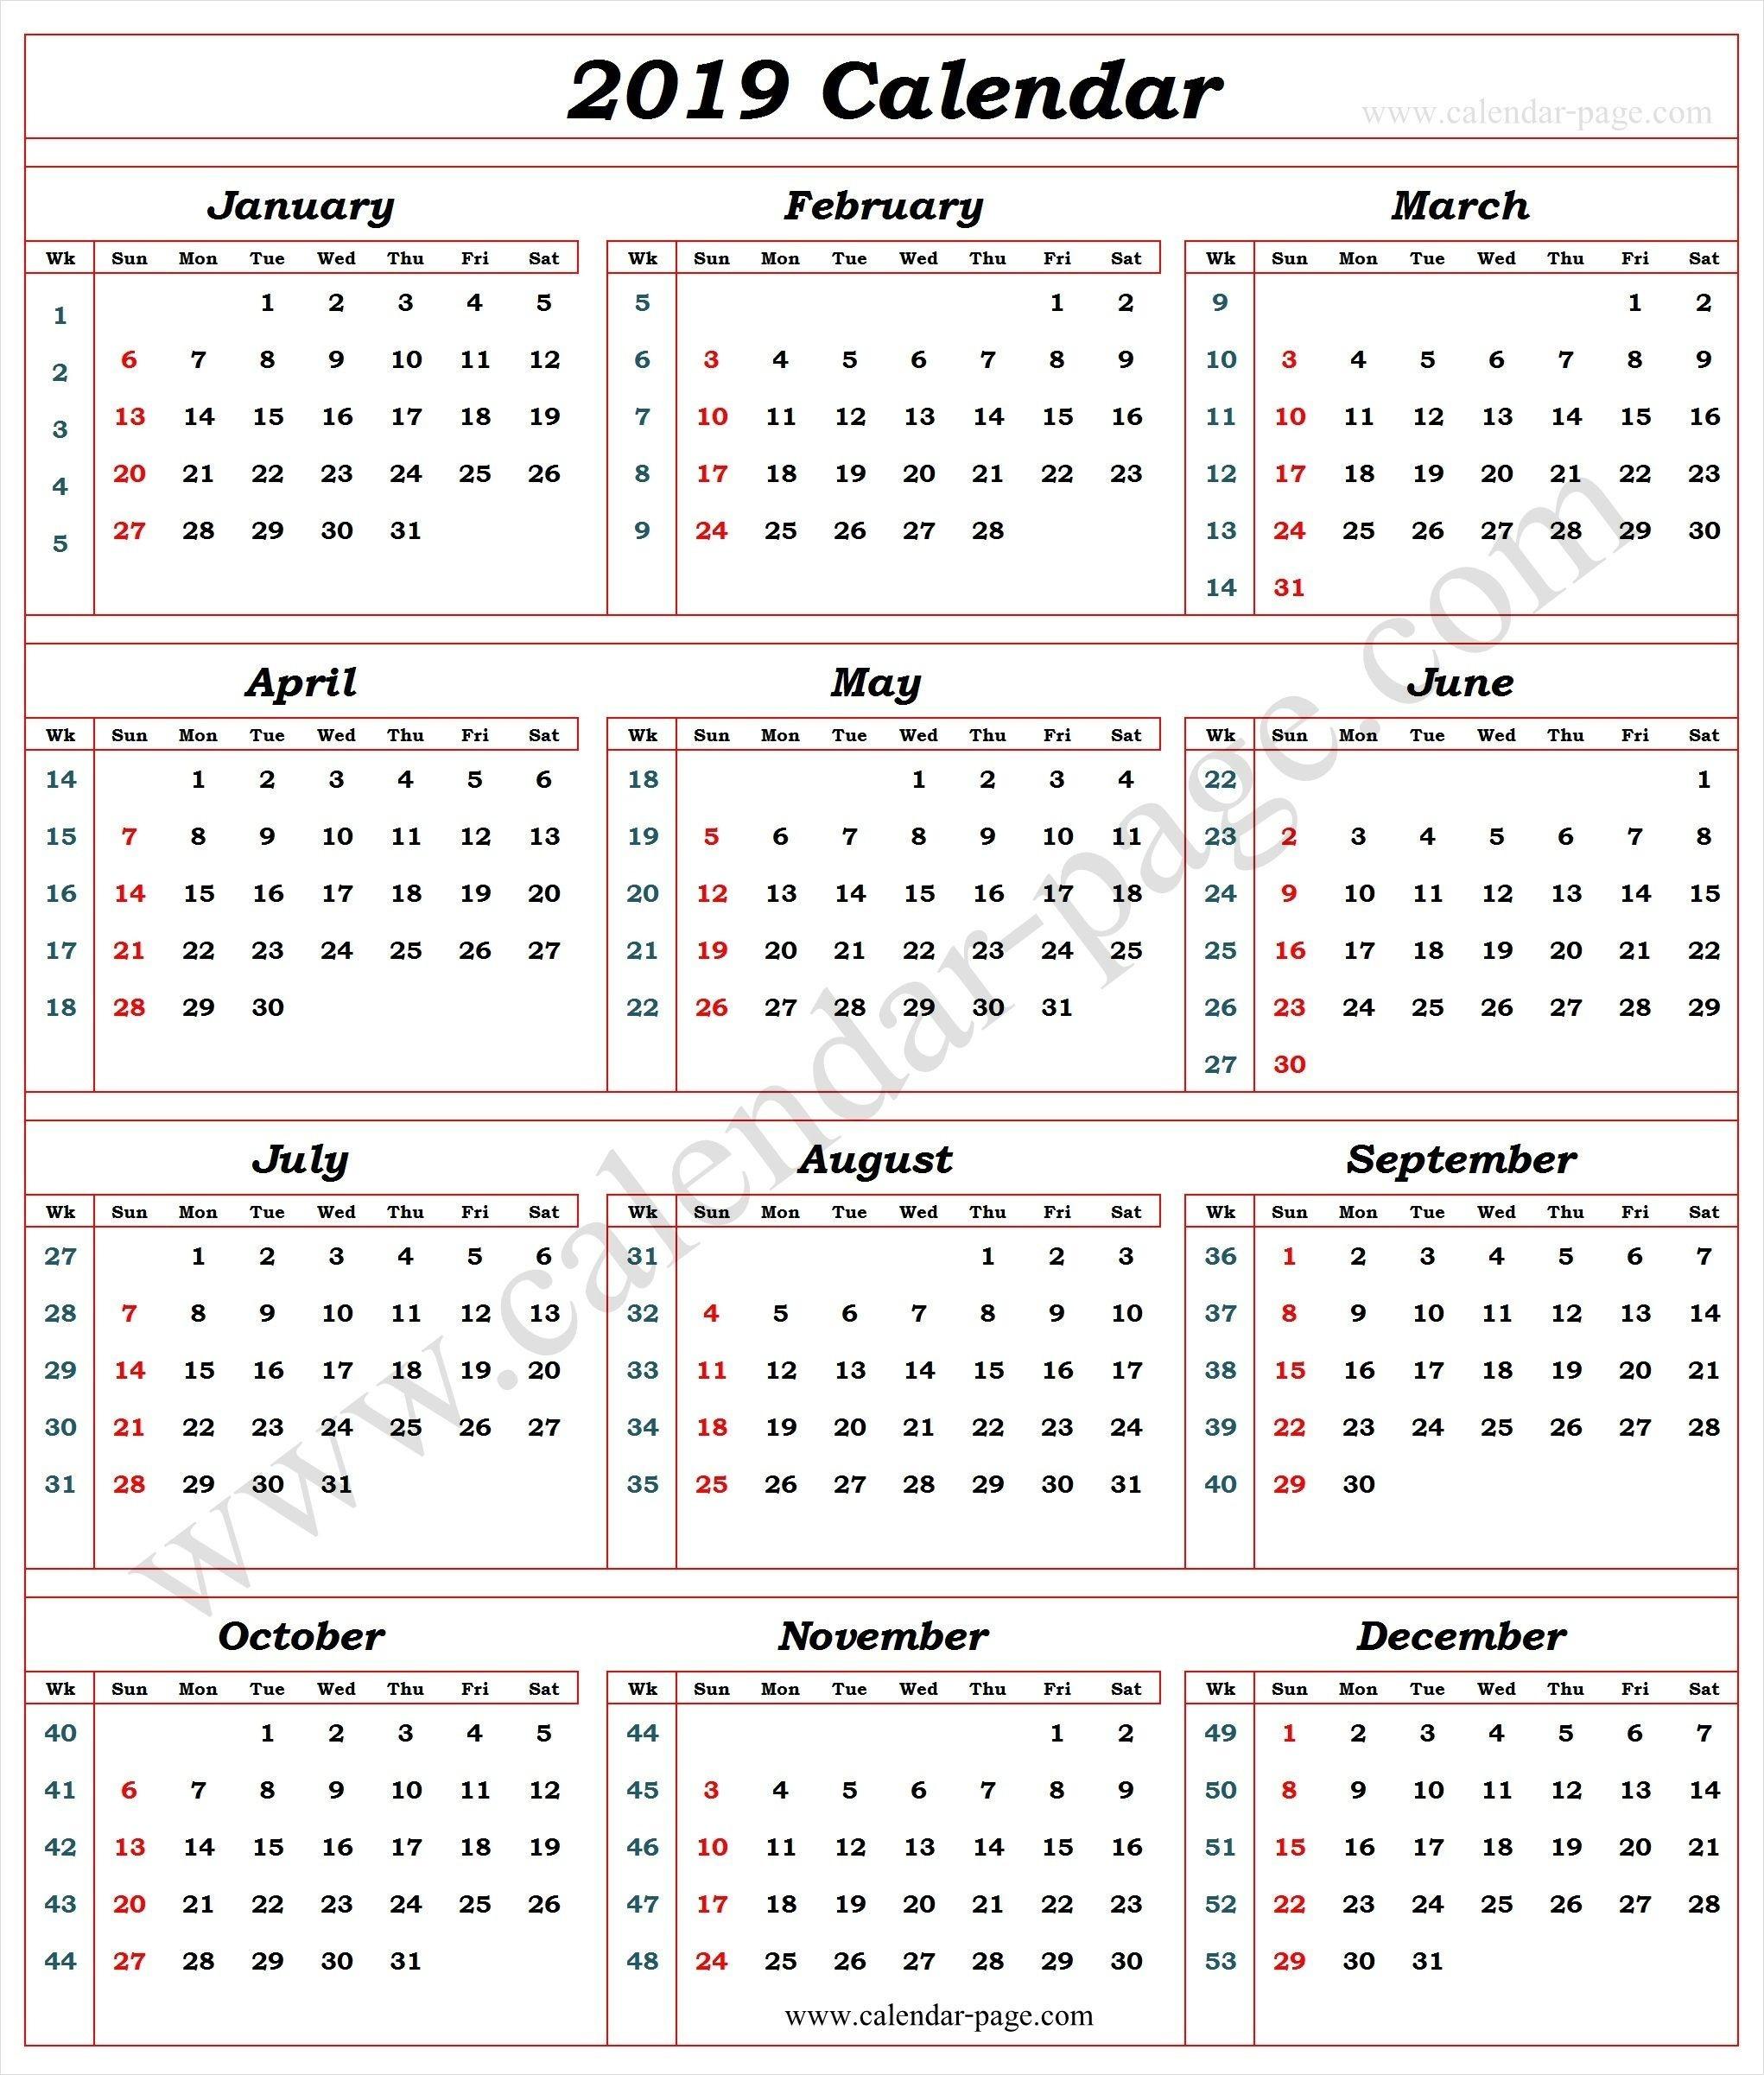 Free Lectionary Calendar For 2021 Jan To Dec - Template  Free United Methodist Church Liturgical Calendar 2021